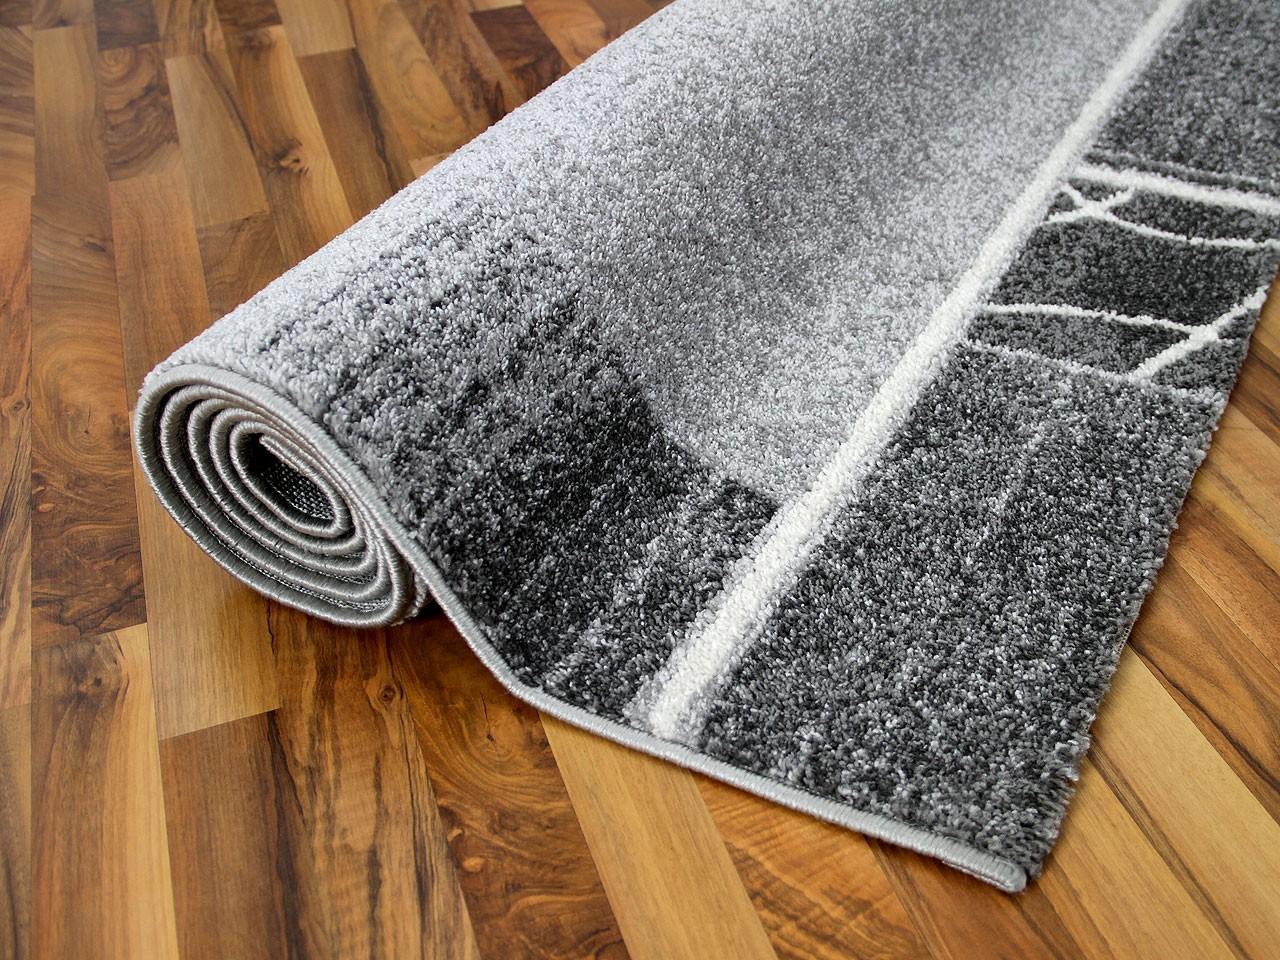 designer teppich softstar silber trend teppiche designerteppiche softstar teppiche. Black Bedroom Furniture Sets. Home Design Ideas